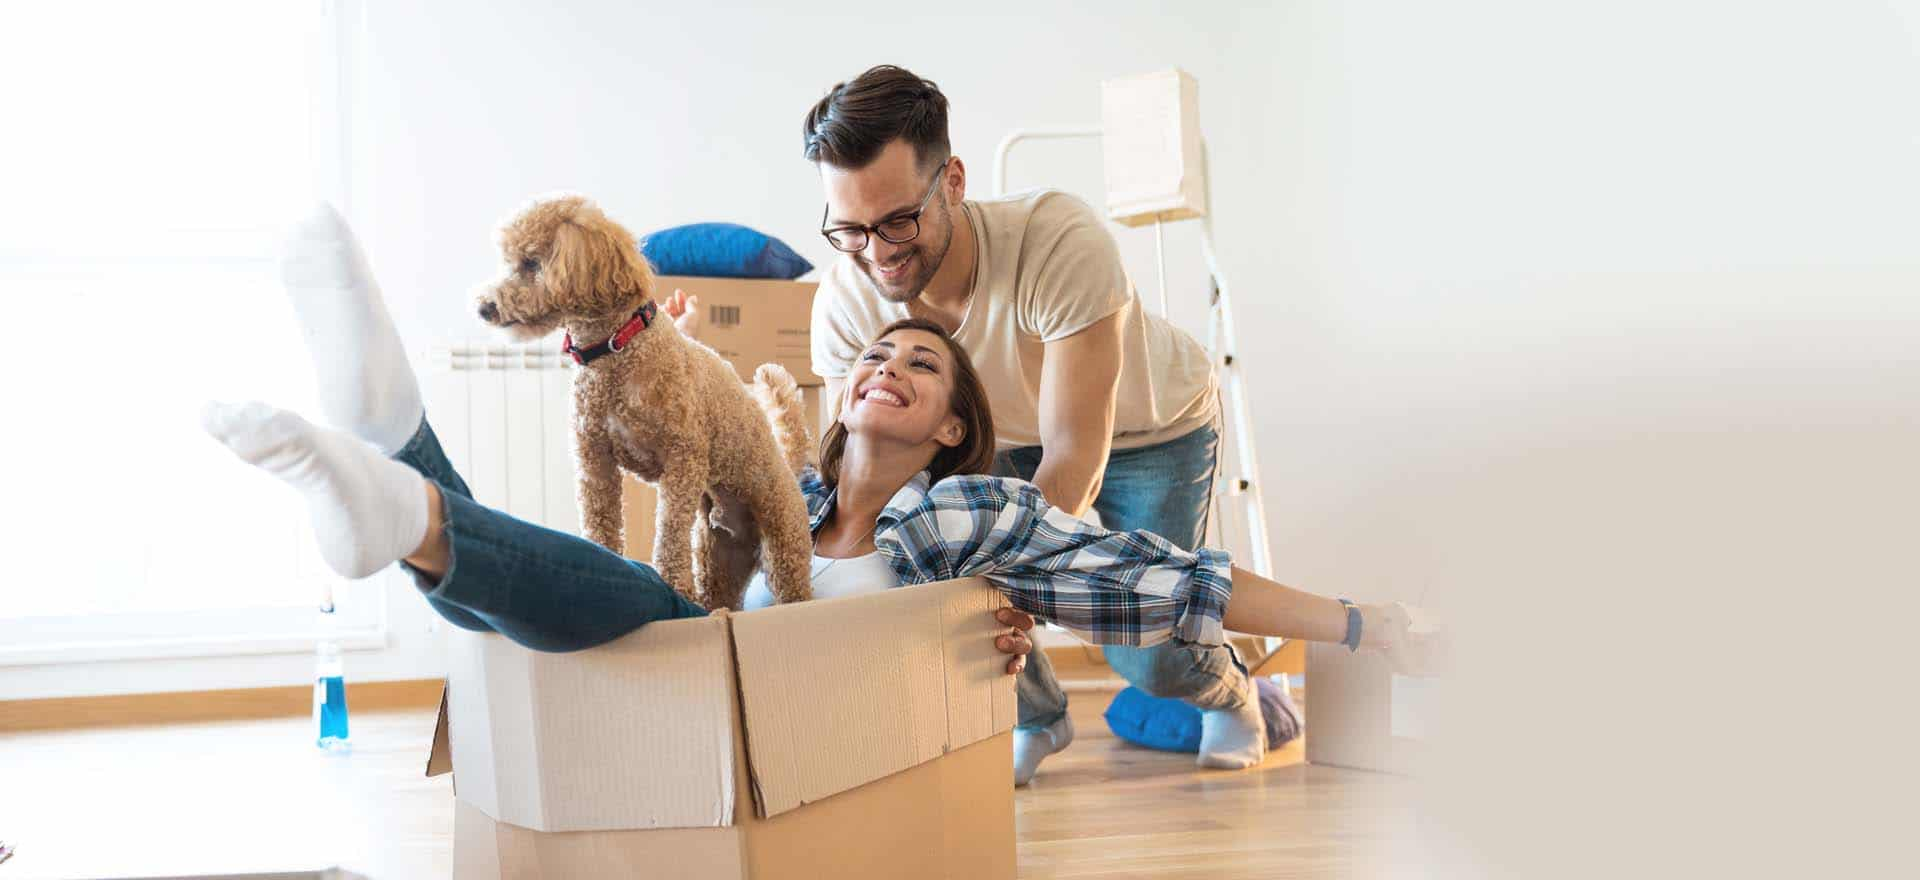 Leva Living Couple Moving Boxes Image